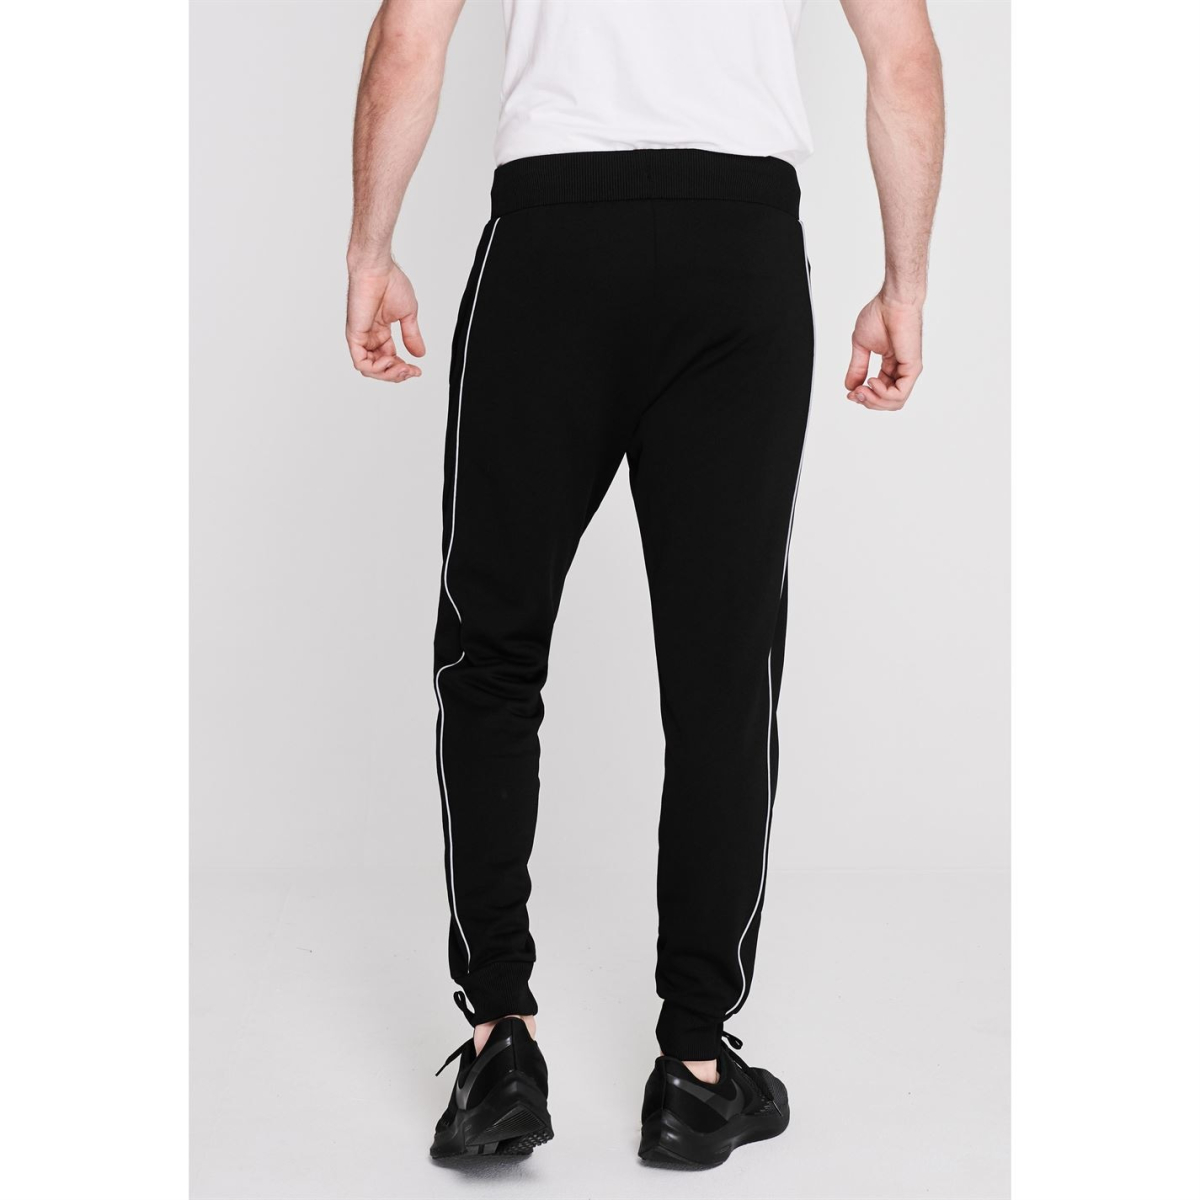 EVERLAST Pantaloni Allenamento Uomo Jogging Pantaloni Pantaloni Sportivi Jogging Fitness 2513